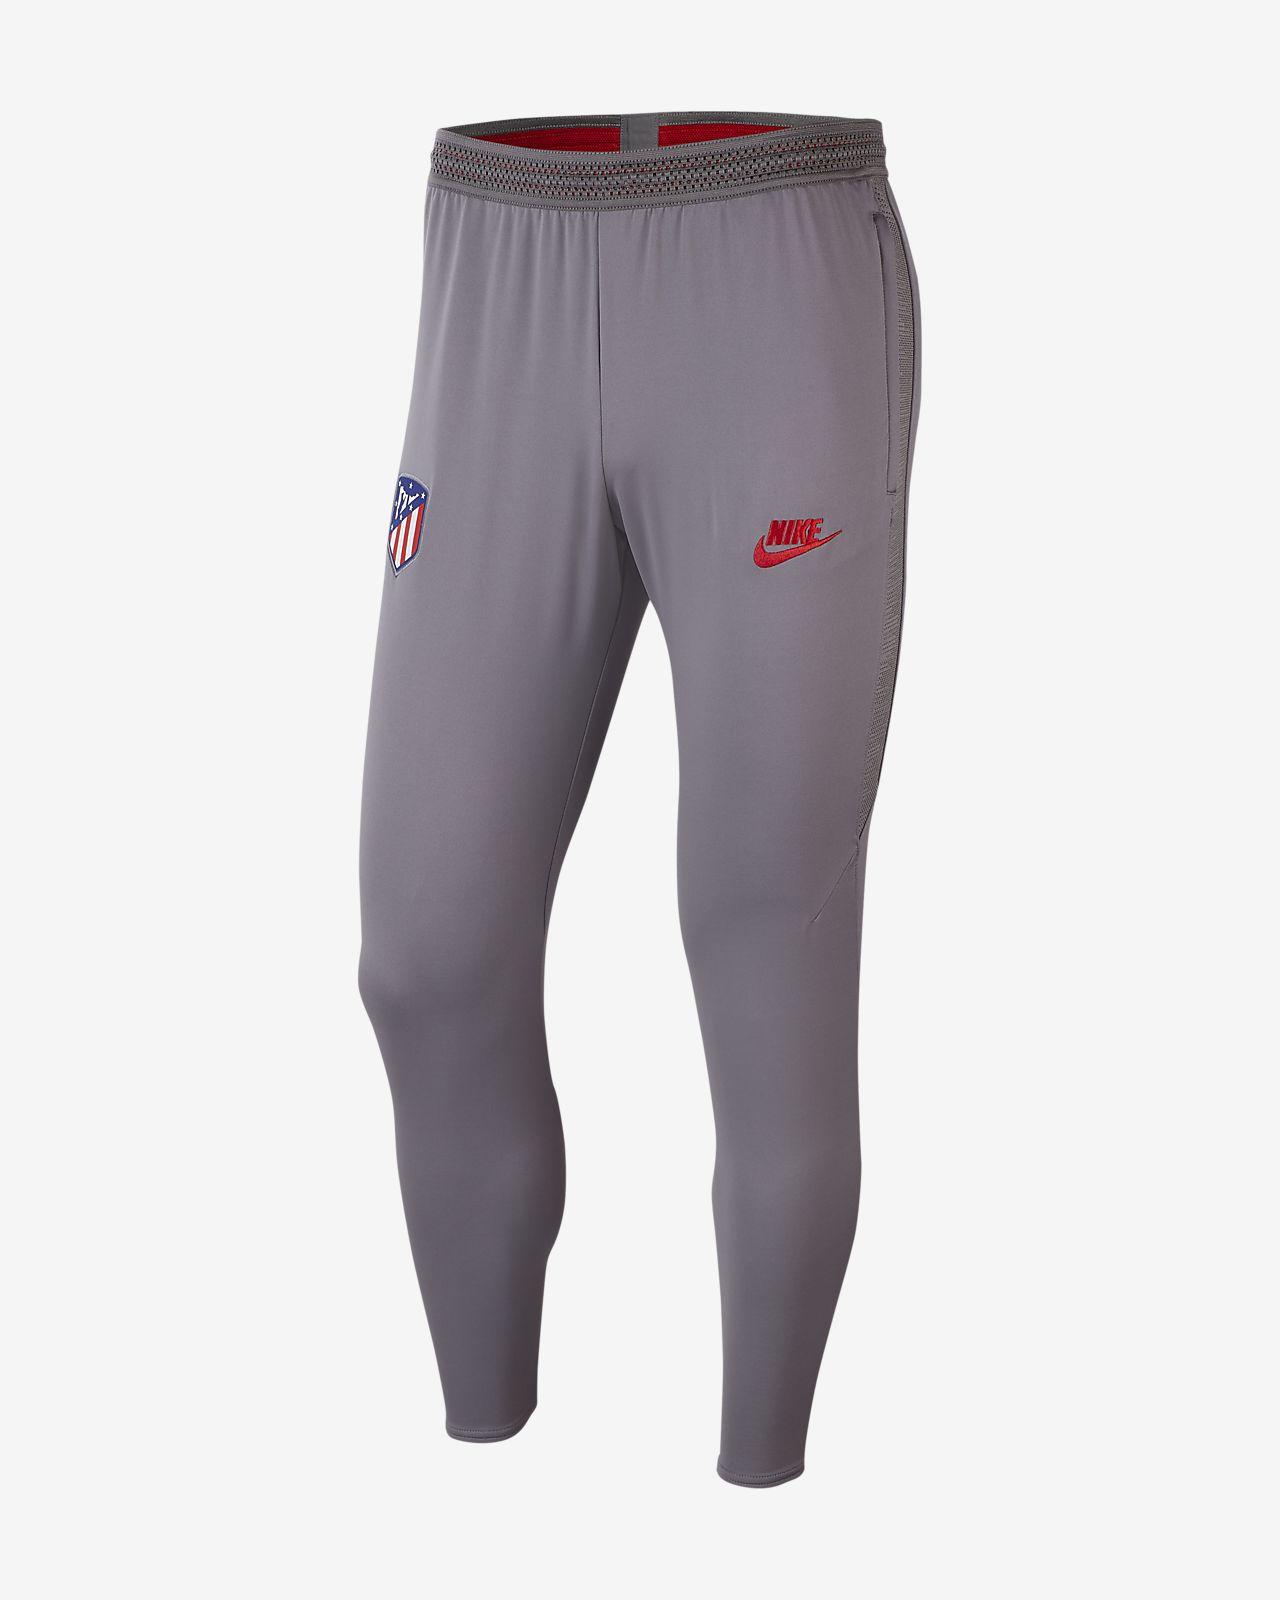 Nike Dri-FIT Atlético de Madrid Strike Pantalons de futbol - Home